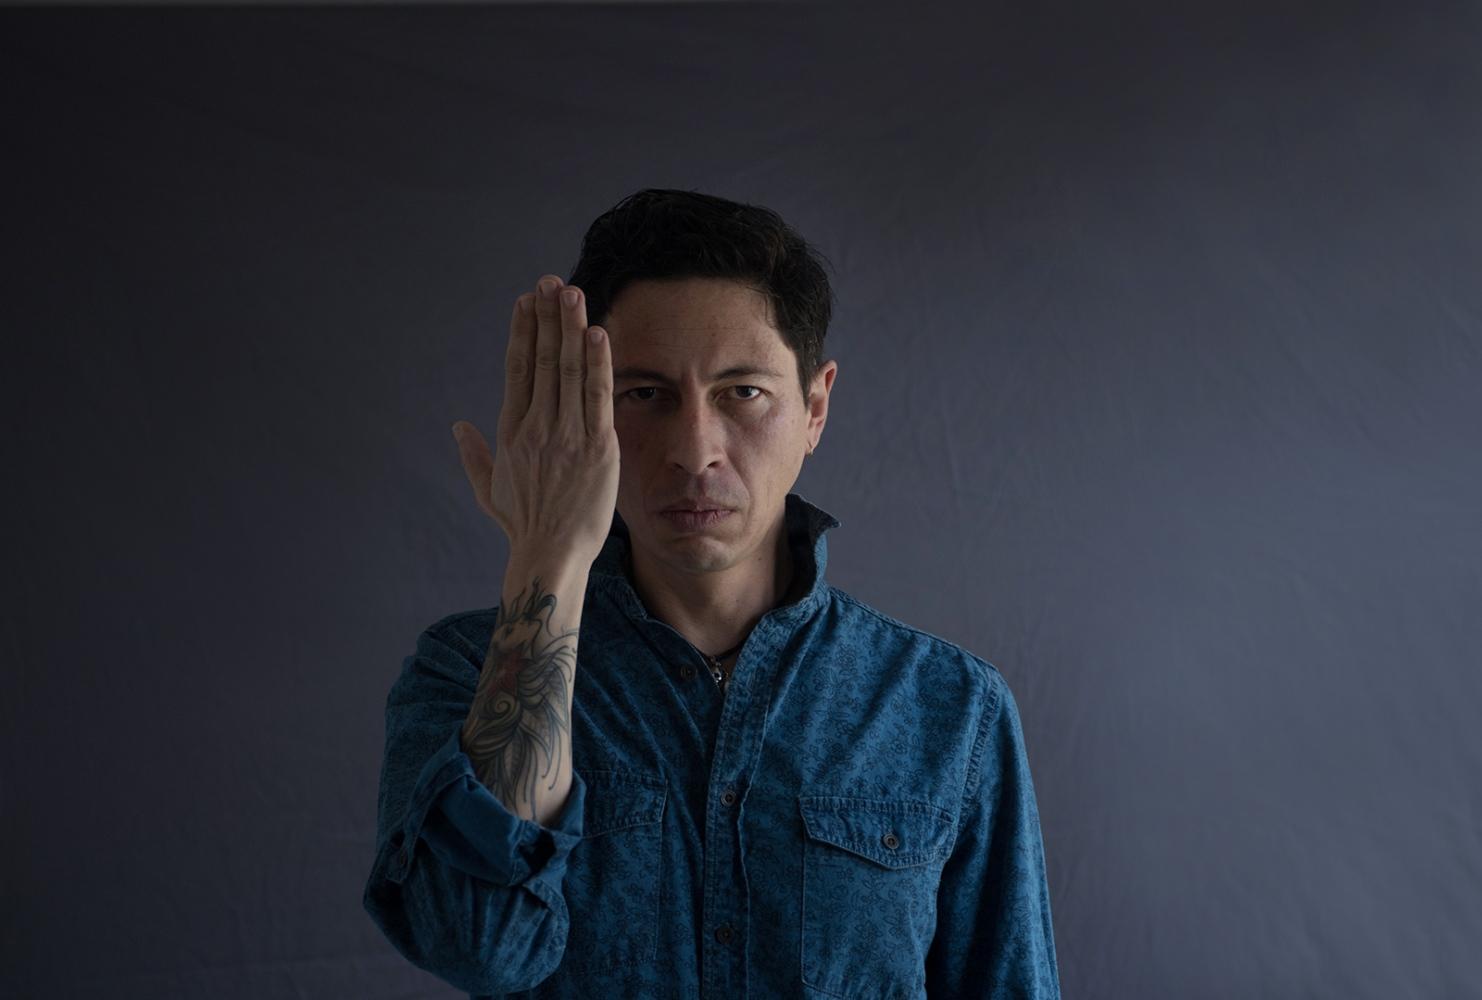 Ozzy Silva, 43, artist, Columbia, MO, originally from Bogota, Colombia. Ozzy Silva, 43, artista y artista de tatuage, Columbia, MO, originalmente de Bogotá, Colombia.